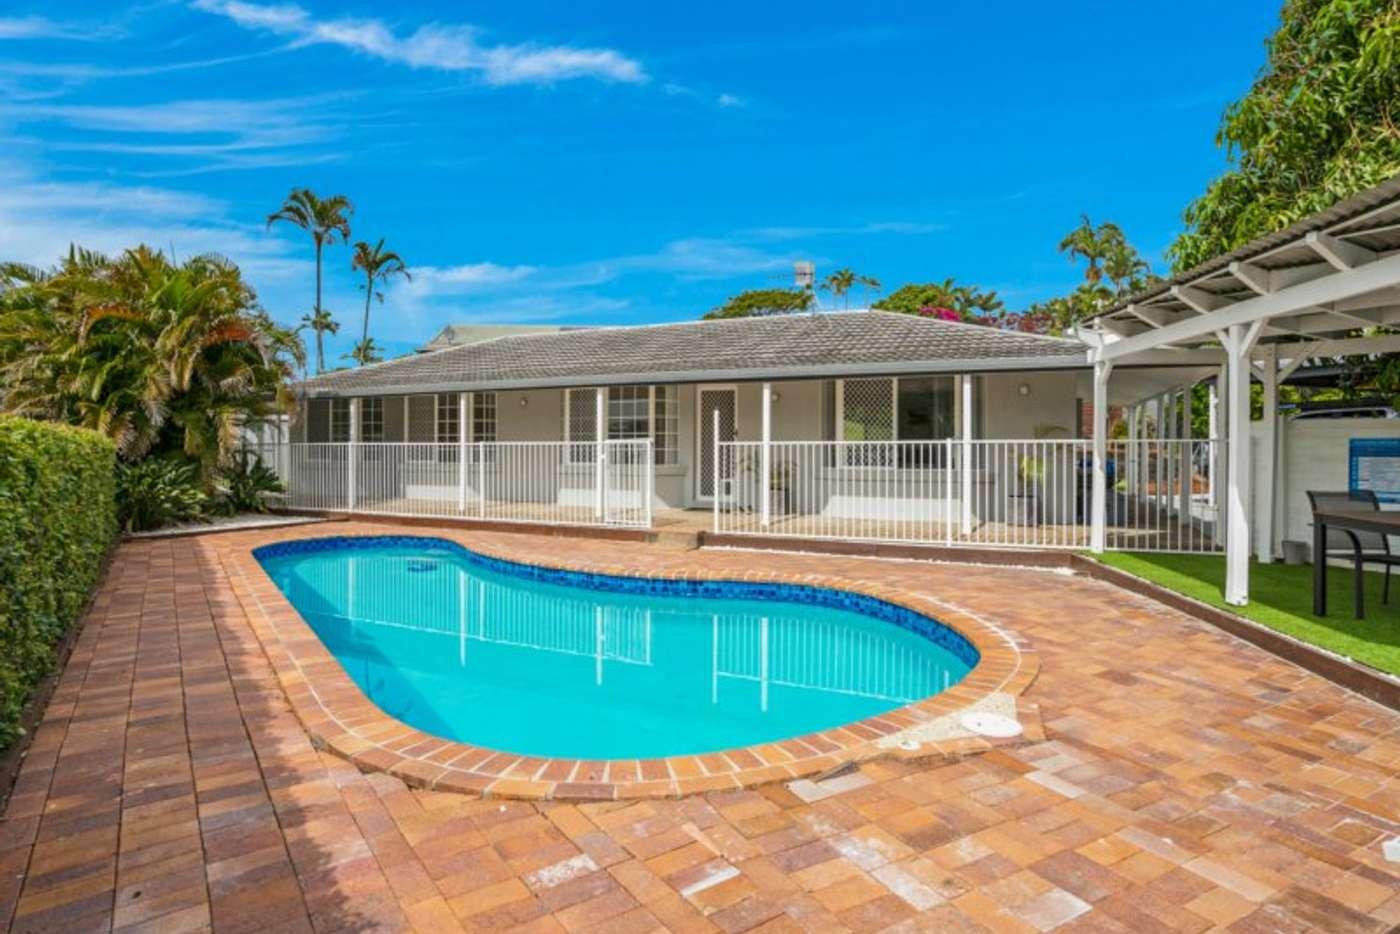 Main view of Homely house listing, 12 Mataranka Drive, Worongary QLD 4213